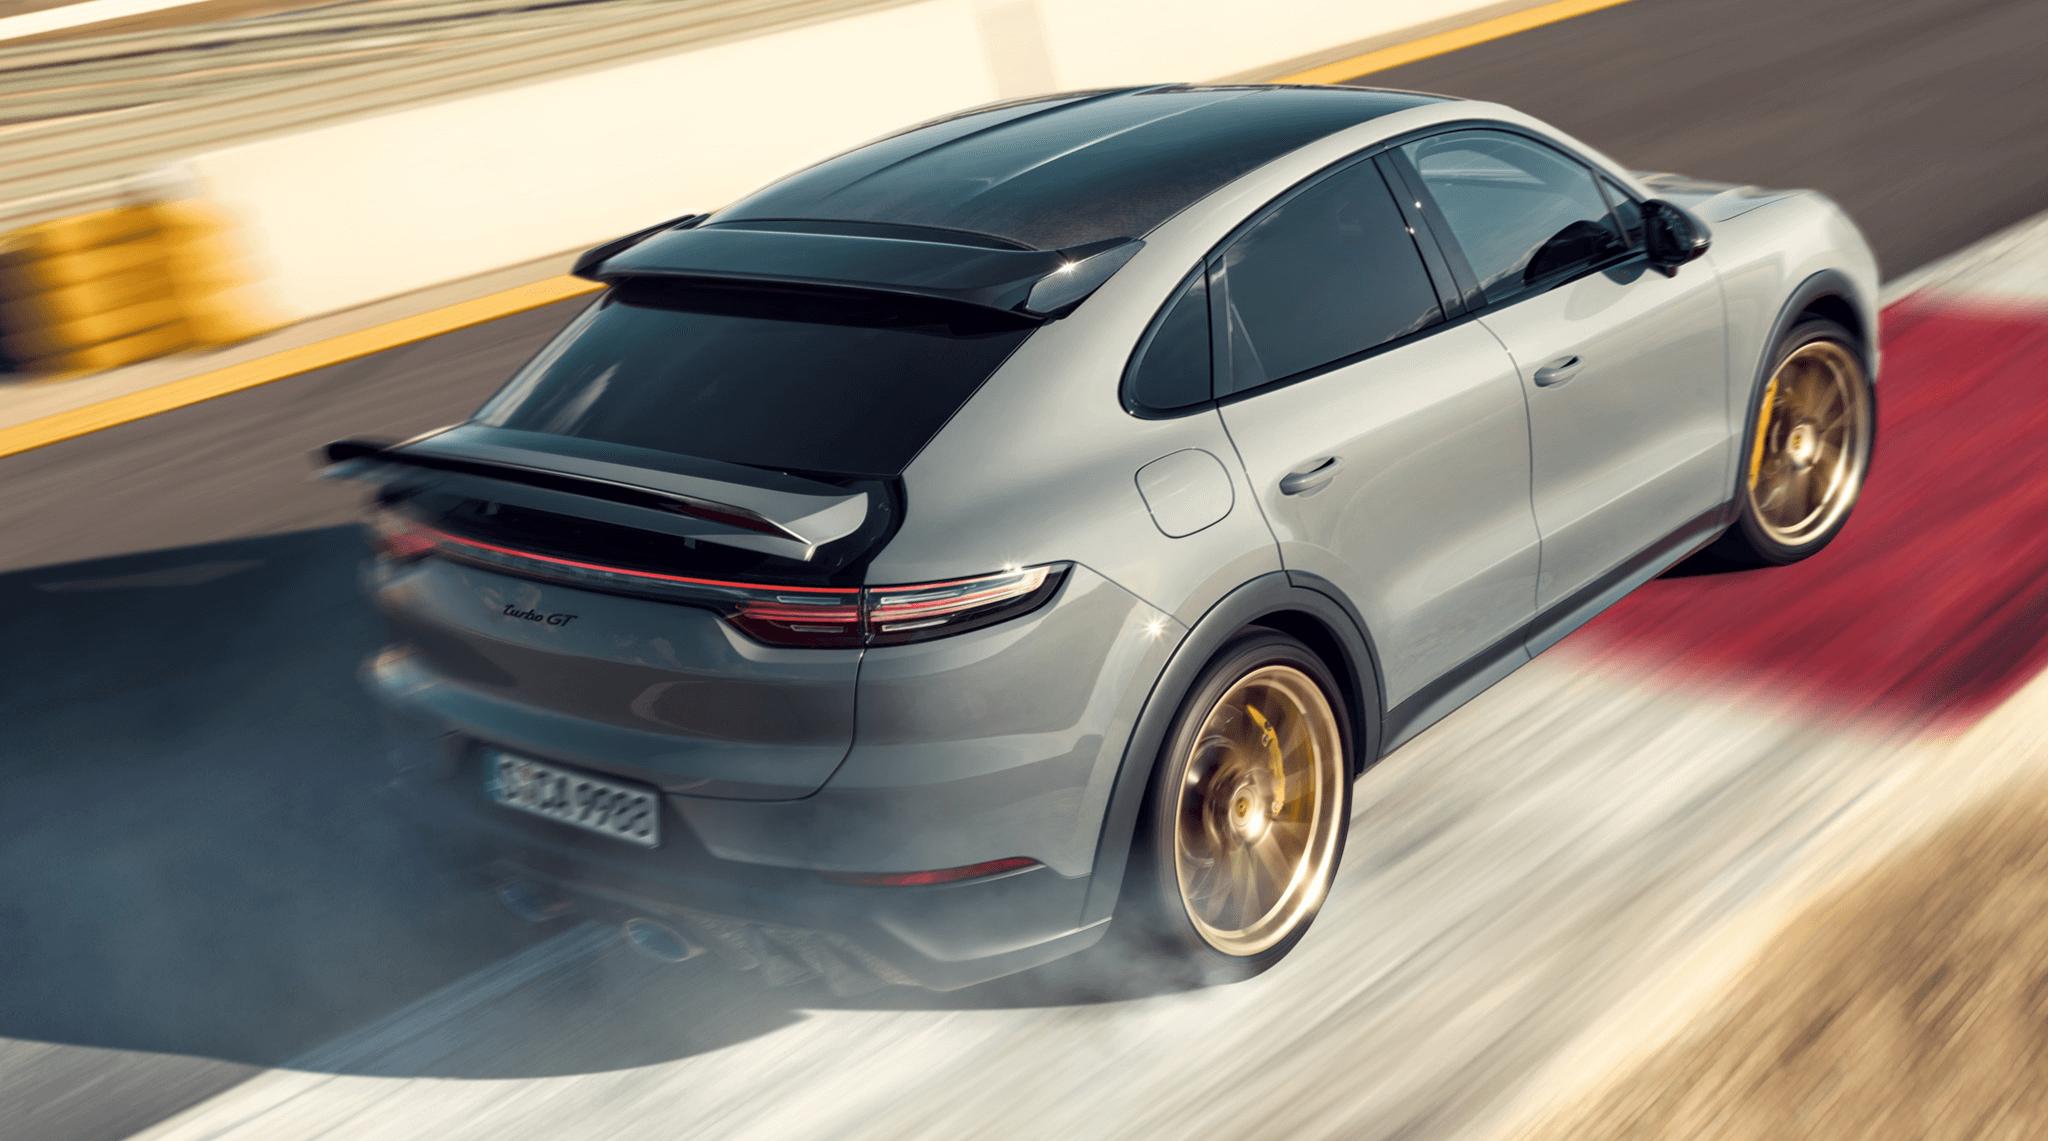 New 2021 Cayenne Turbo GT2